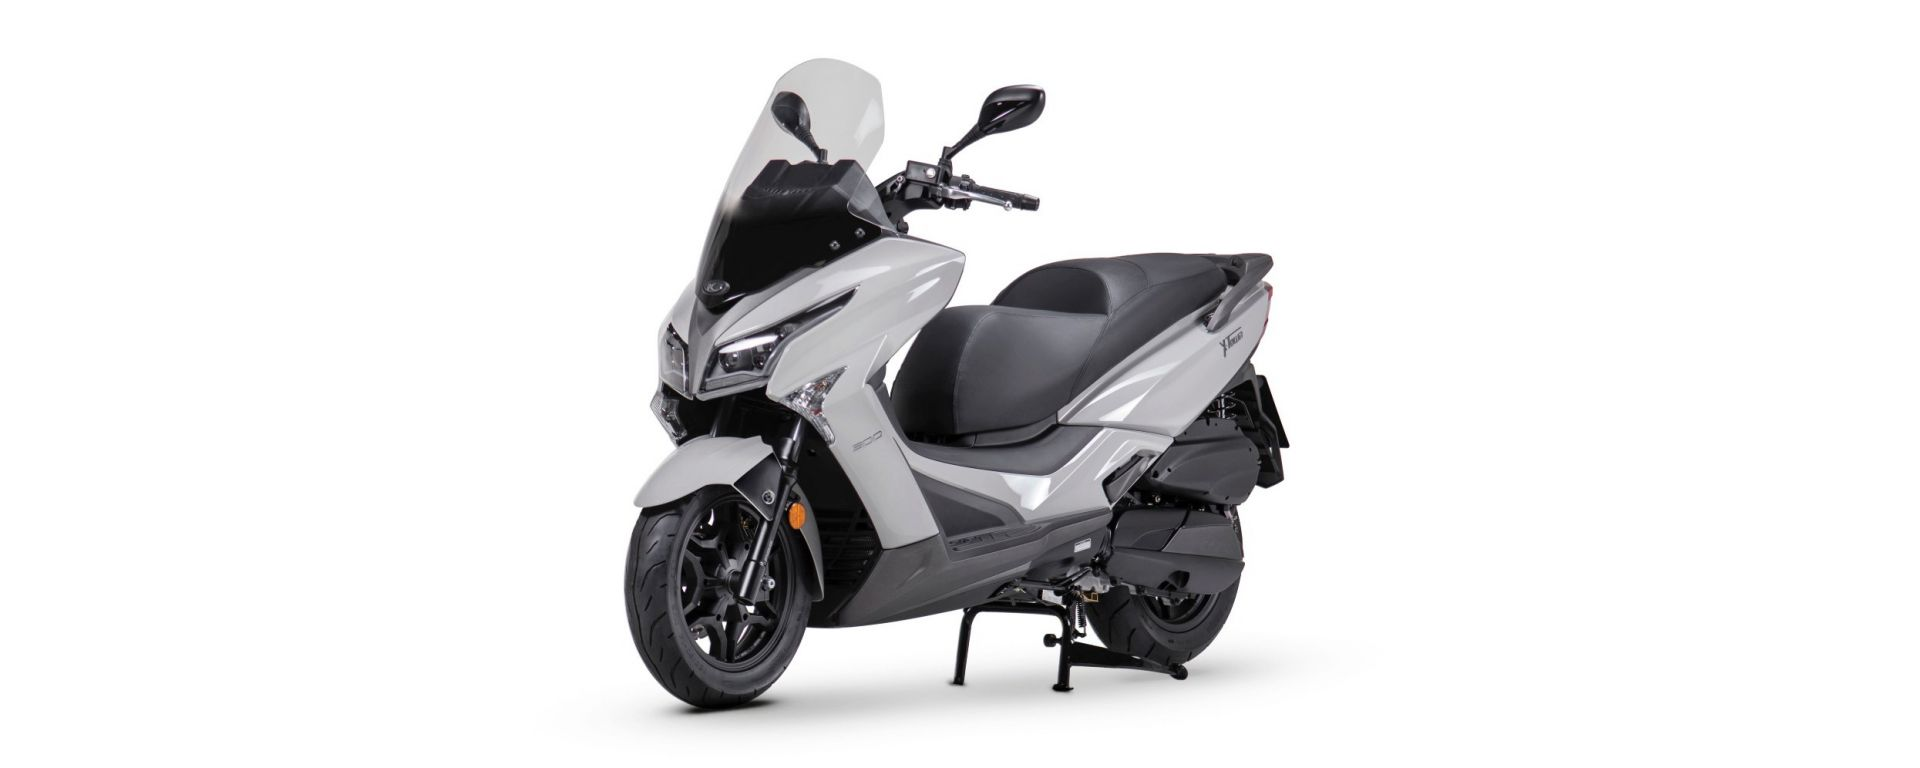 Kymco X-Town 300i ABS 2021: arriva l'Euro 5